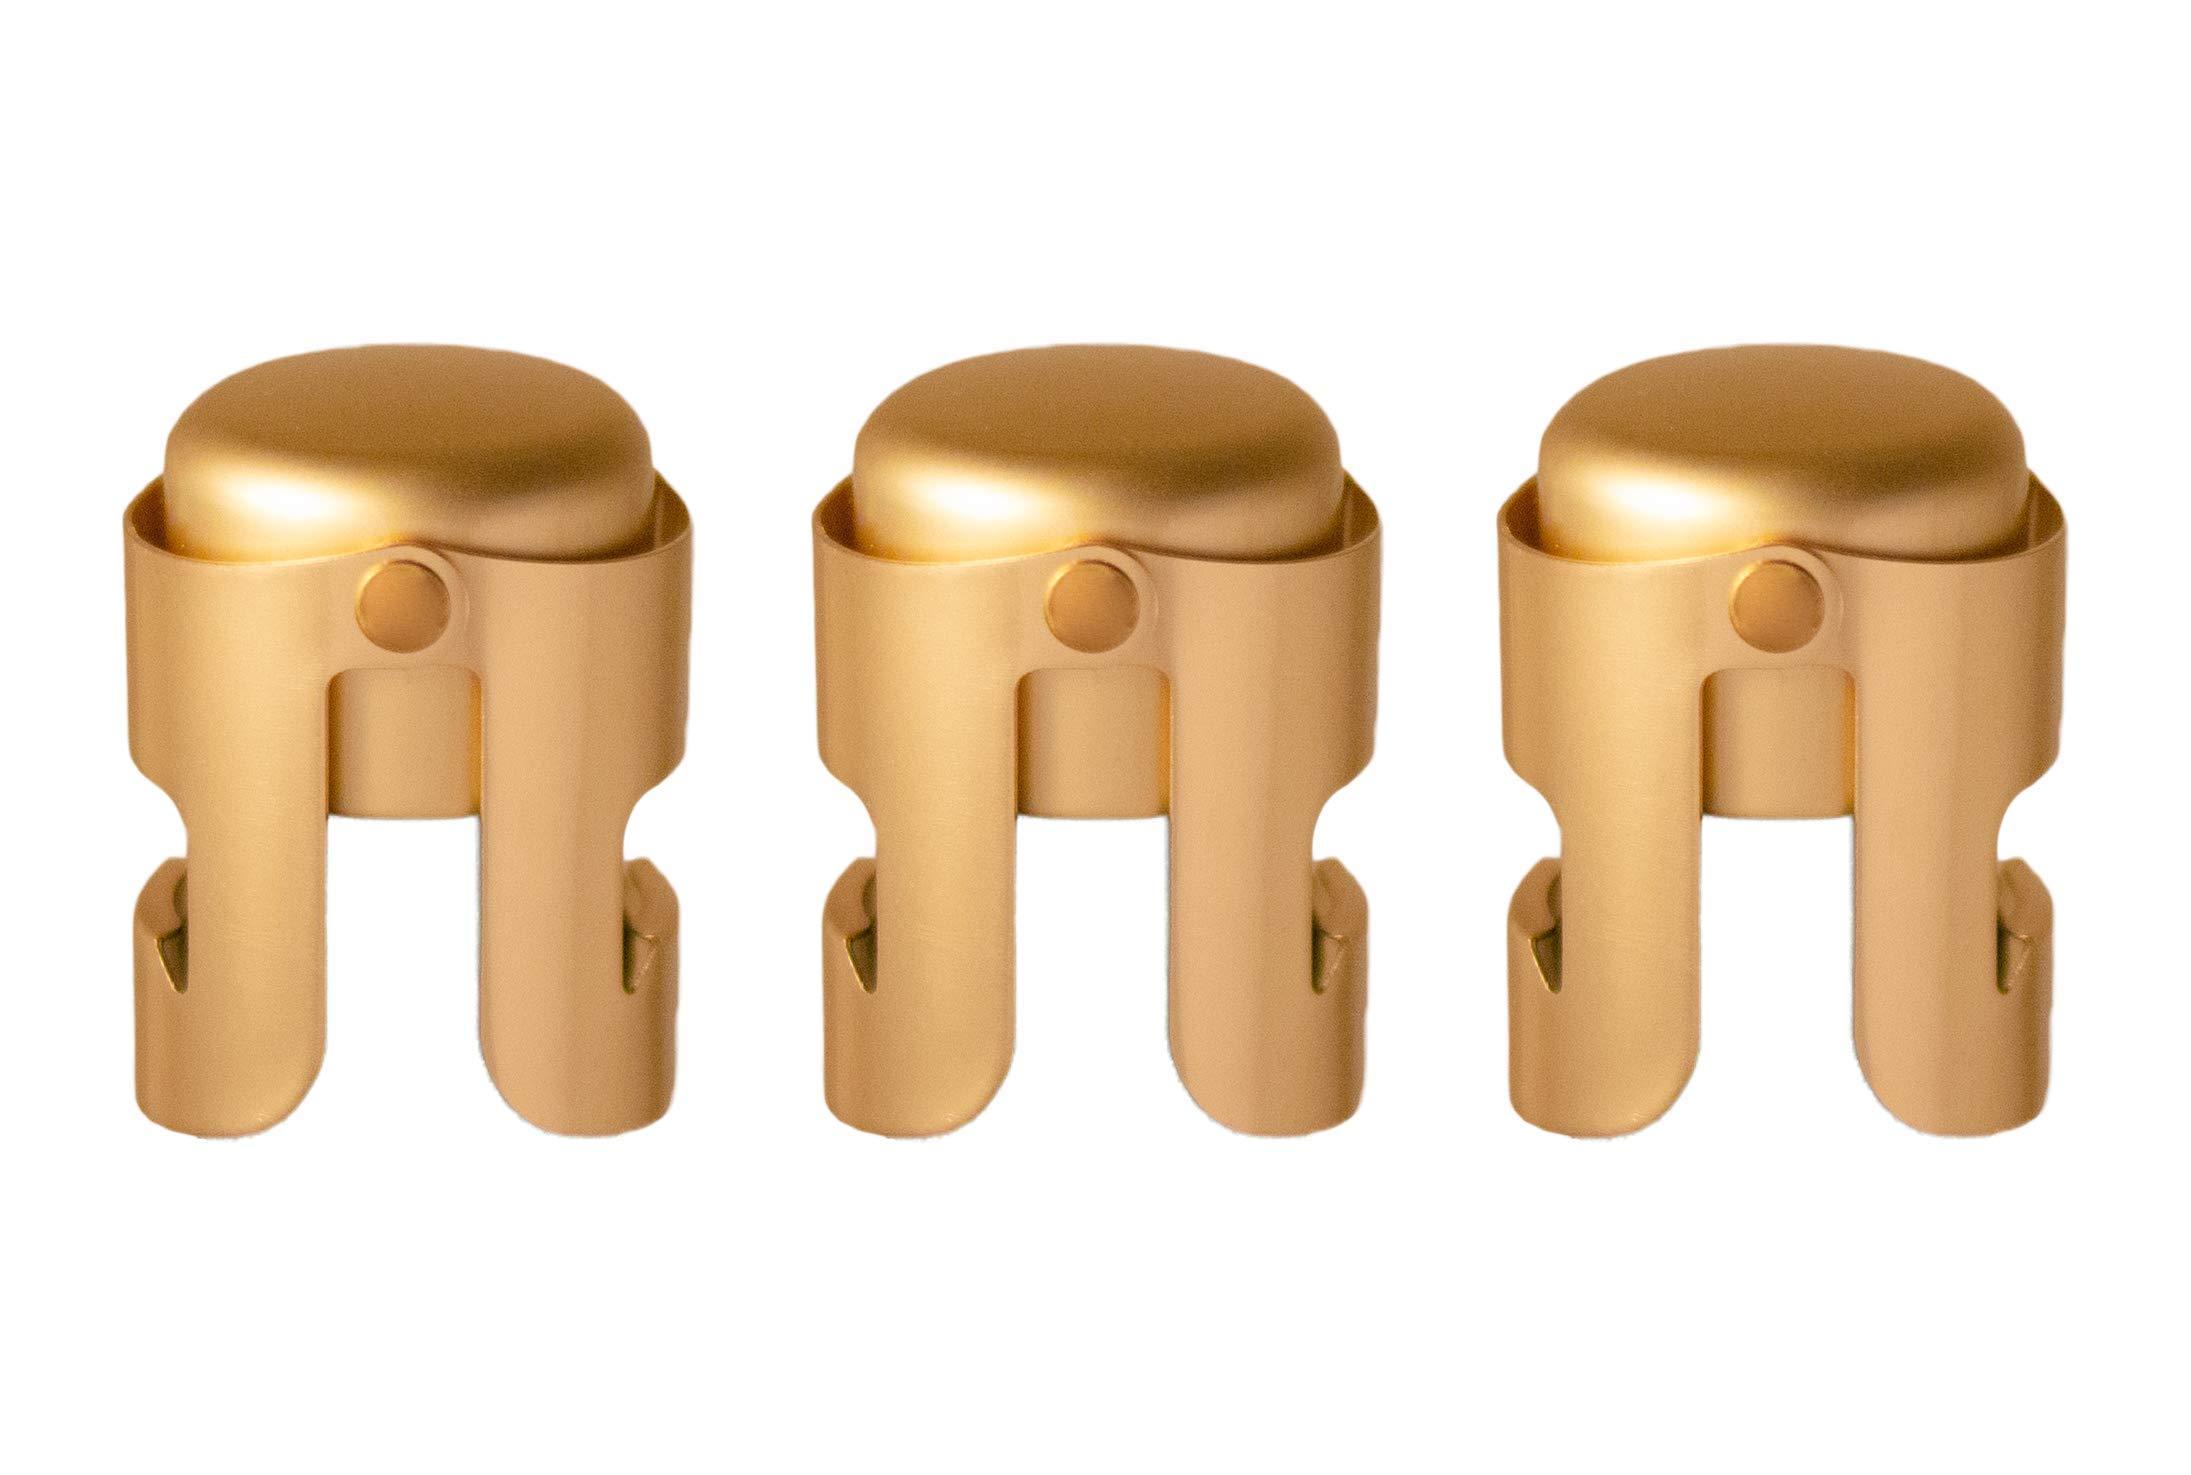 Gold Champagne Stopper (3 Pkg), Designed in France, Bottle Sealer for Cava, Prosecco, Sparkling Wine, Gold Plated, No Sharp Edge, Simple Design, No Leaks, No Spills, Passed 13 lbs Pressure Test